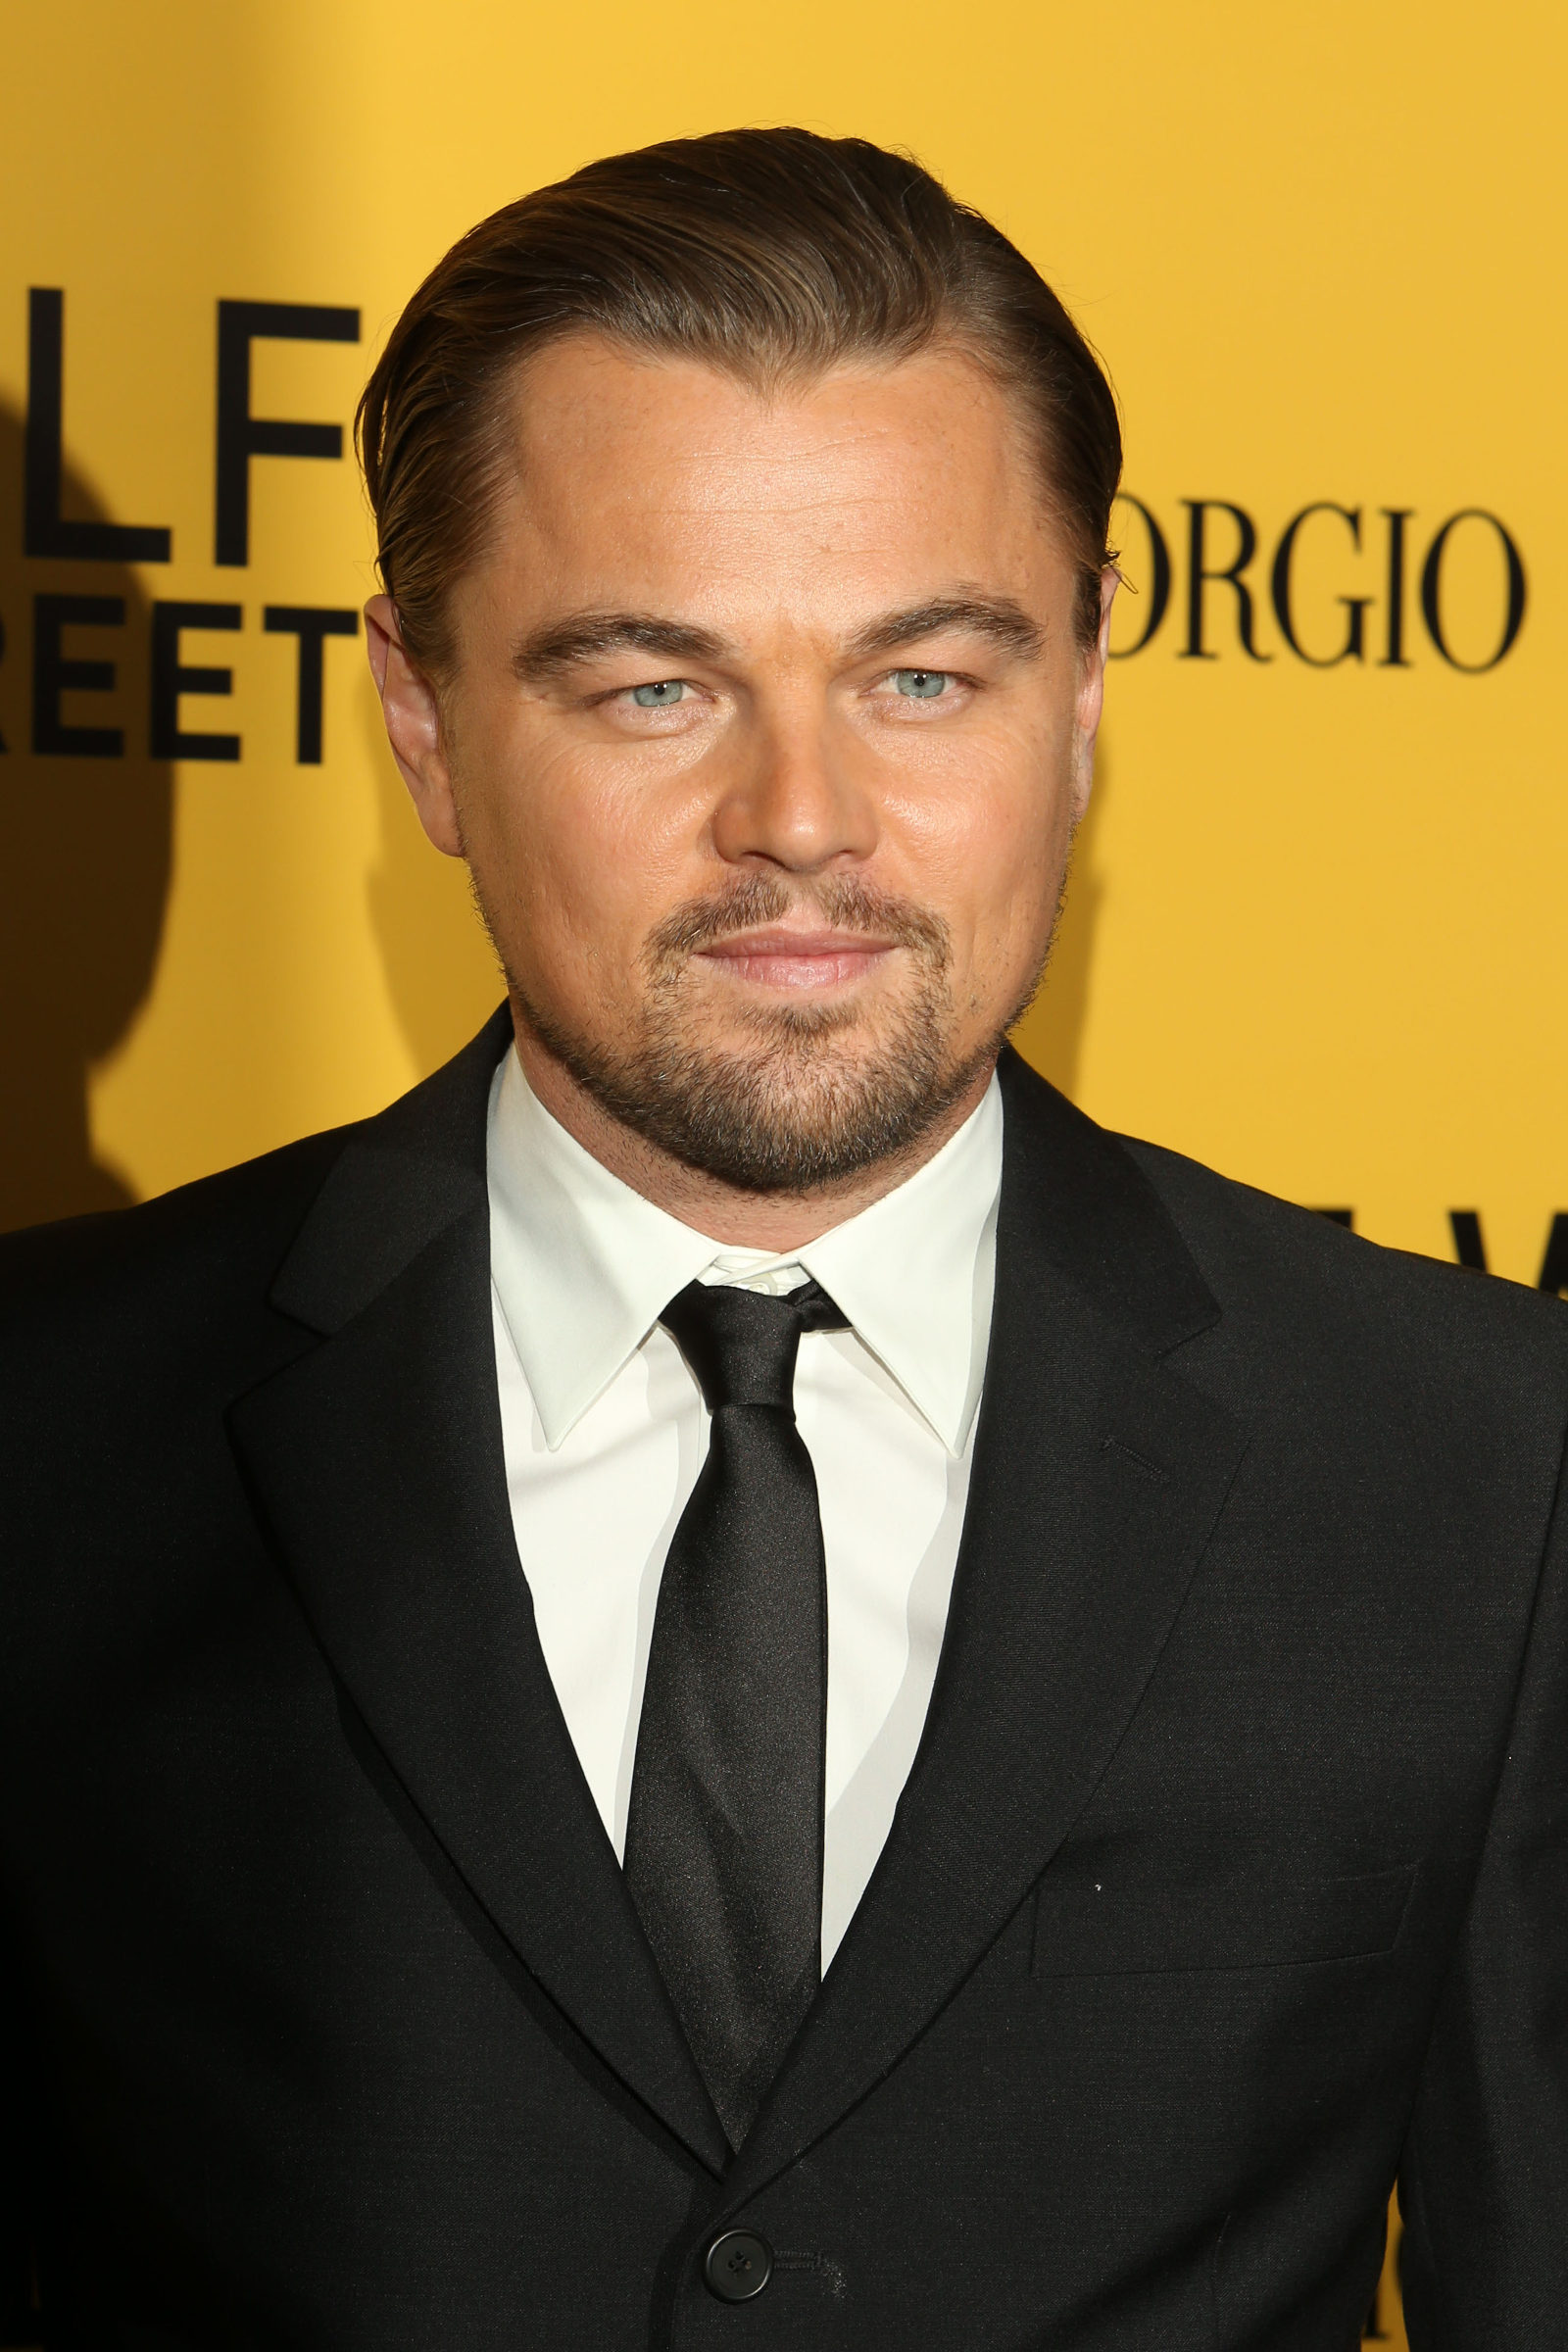 Leonardo DiCaprio - Window's Peak - Slicked Back